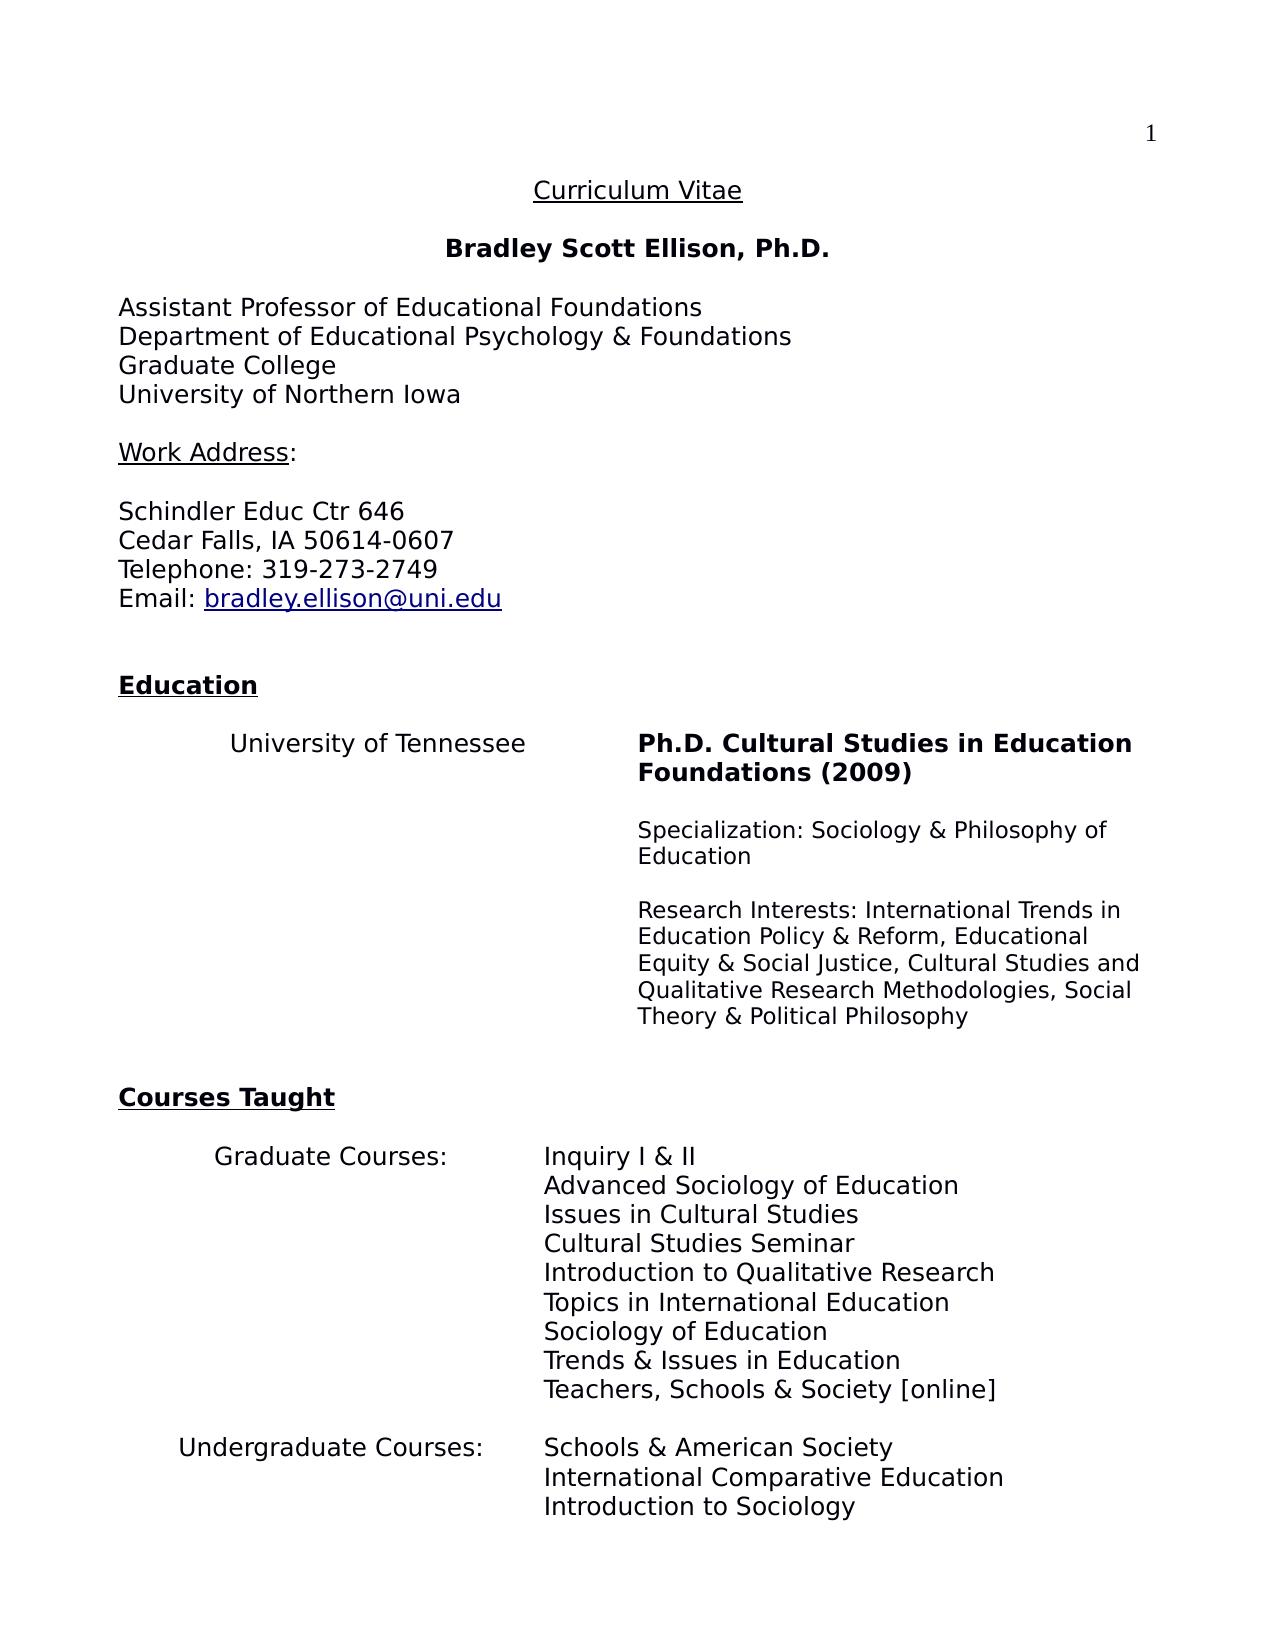 sociology of education topics